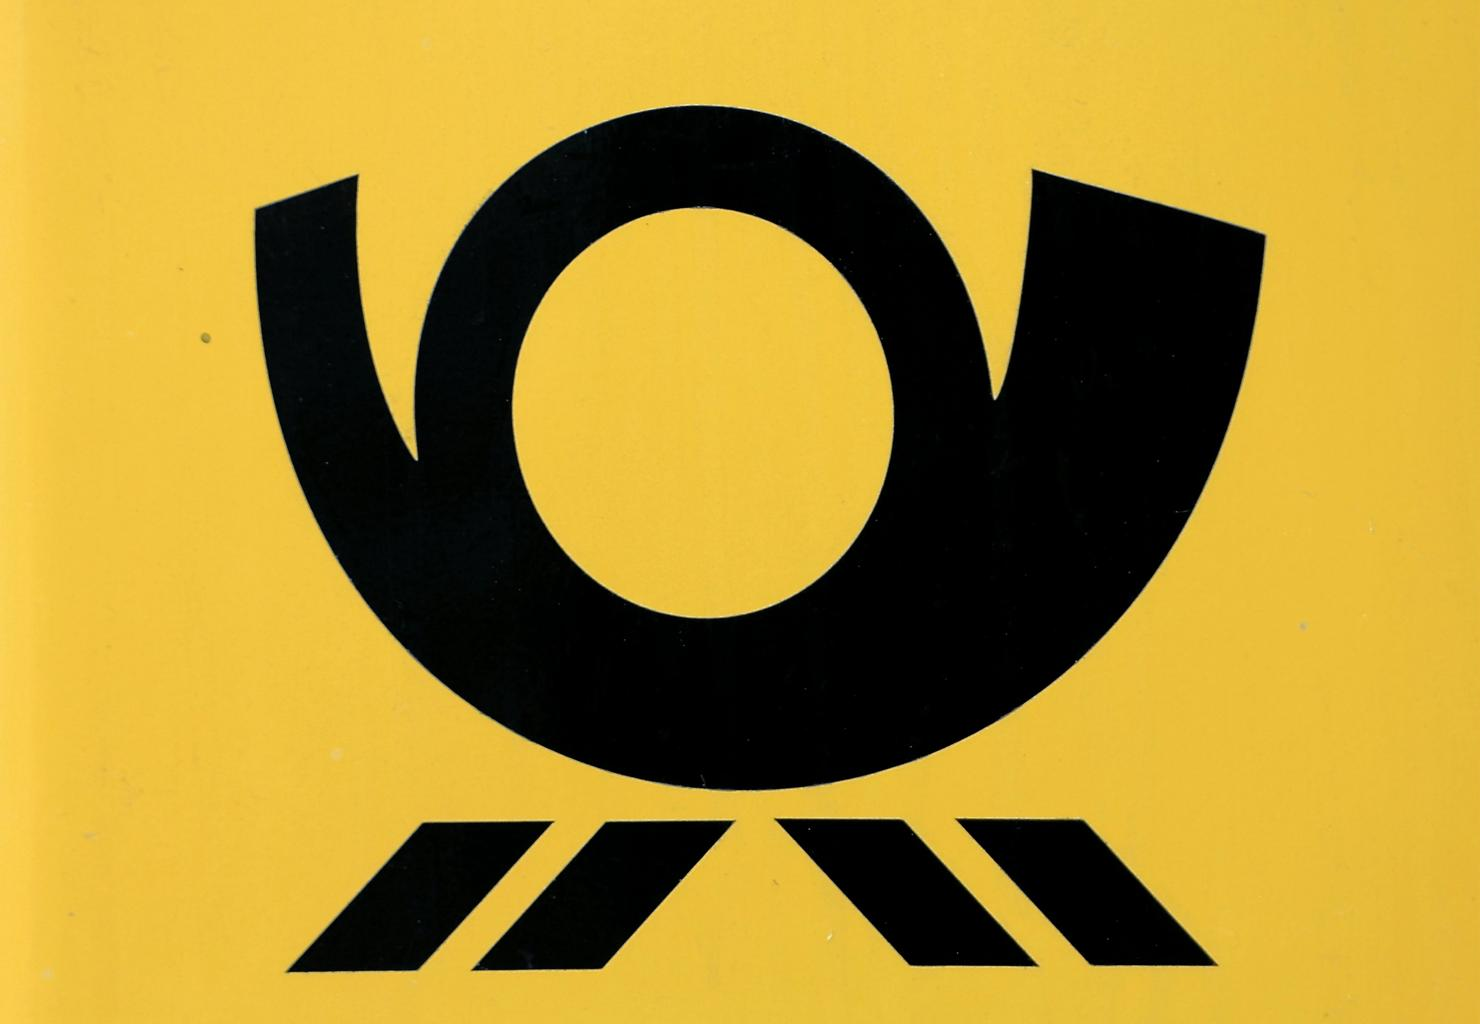 logo pošty